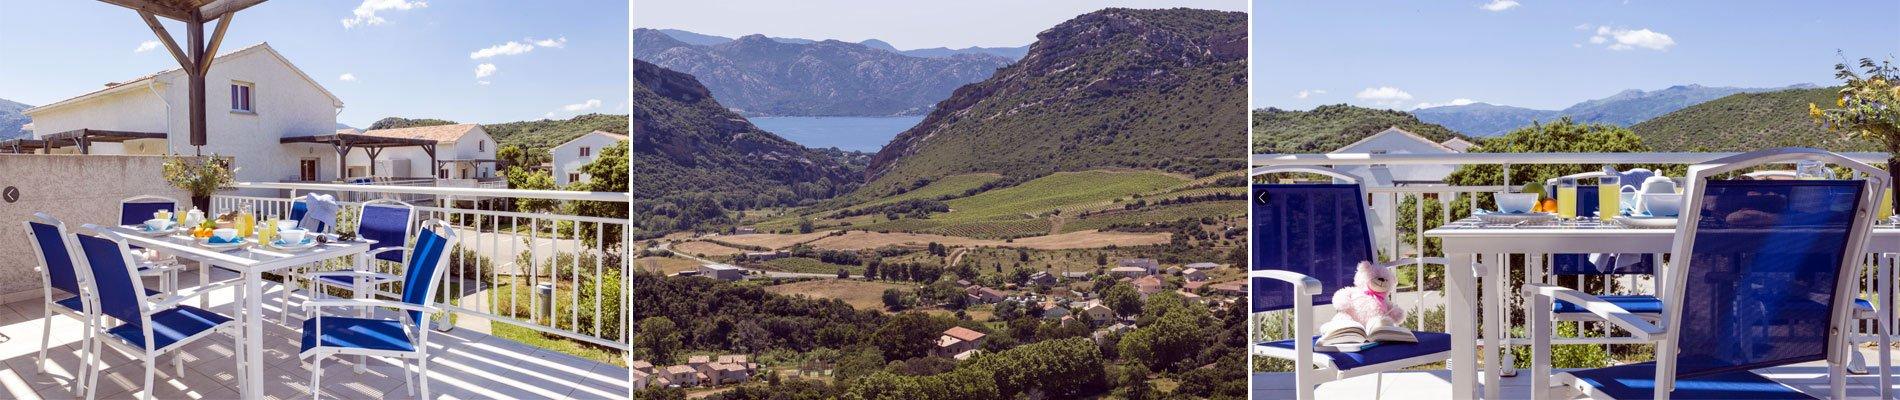 casa-orinaju-odalys-corsica